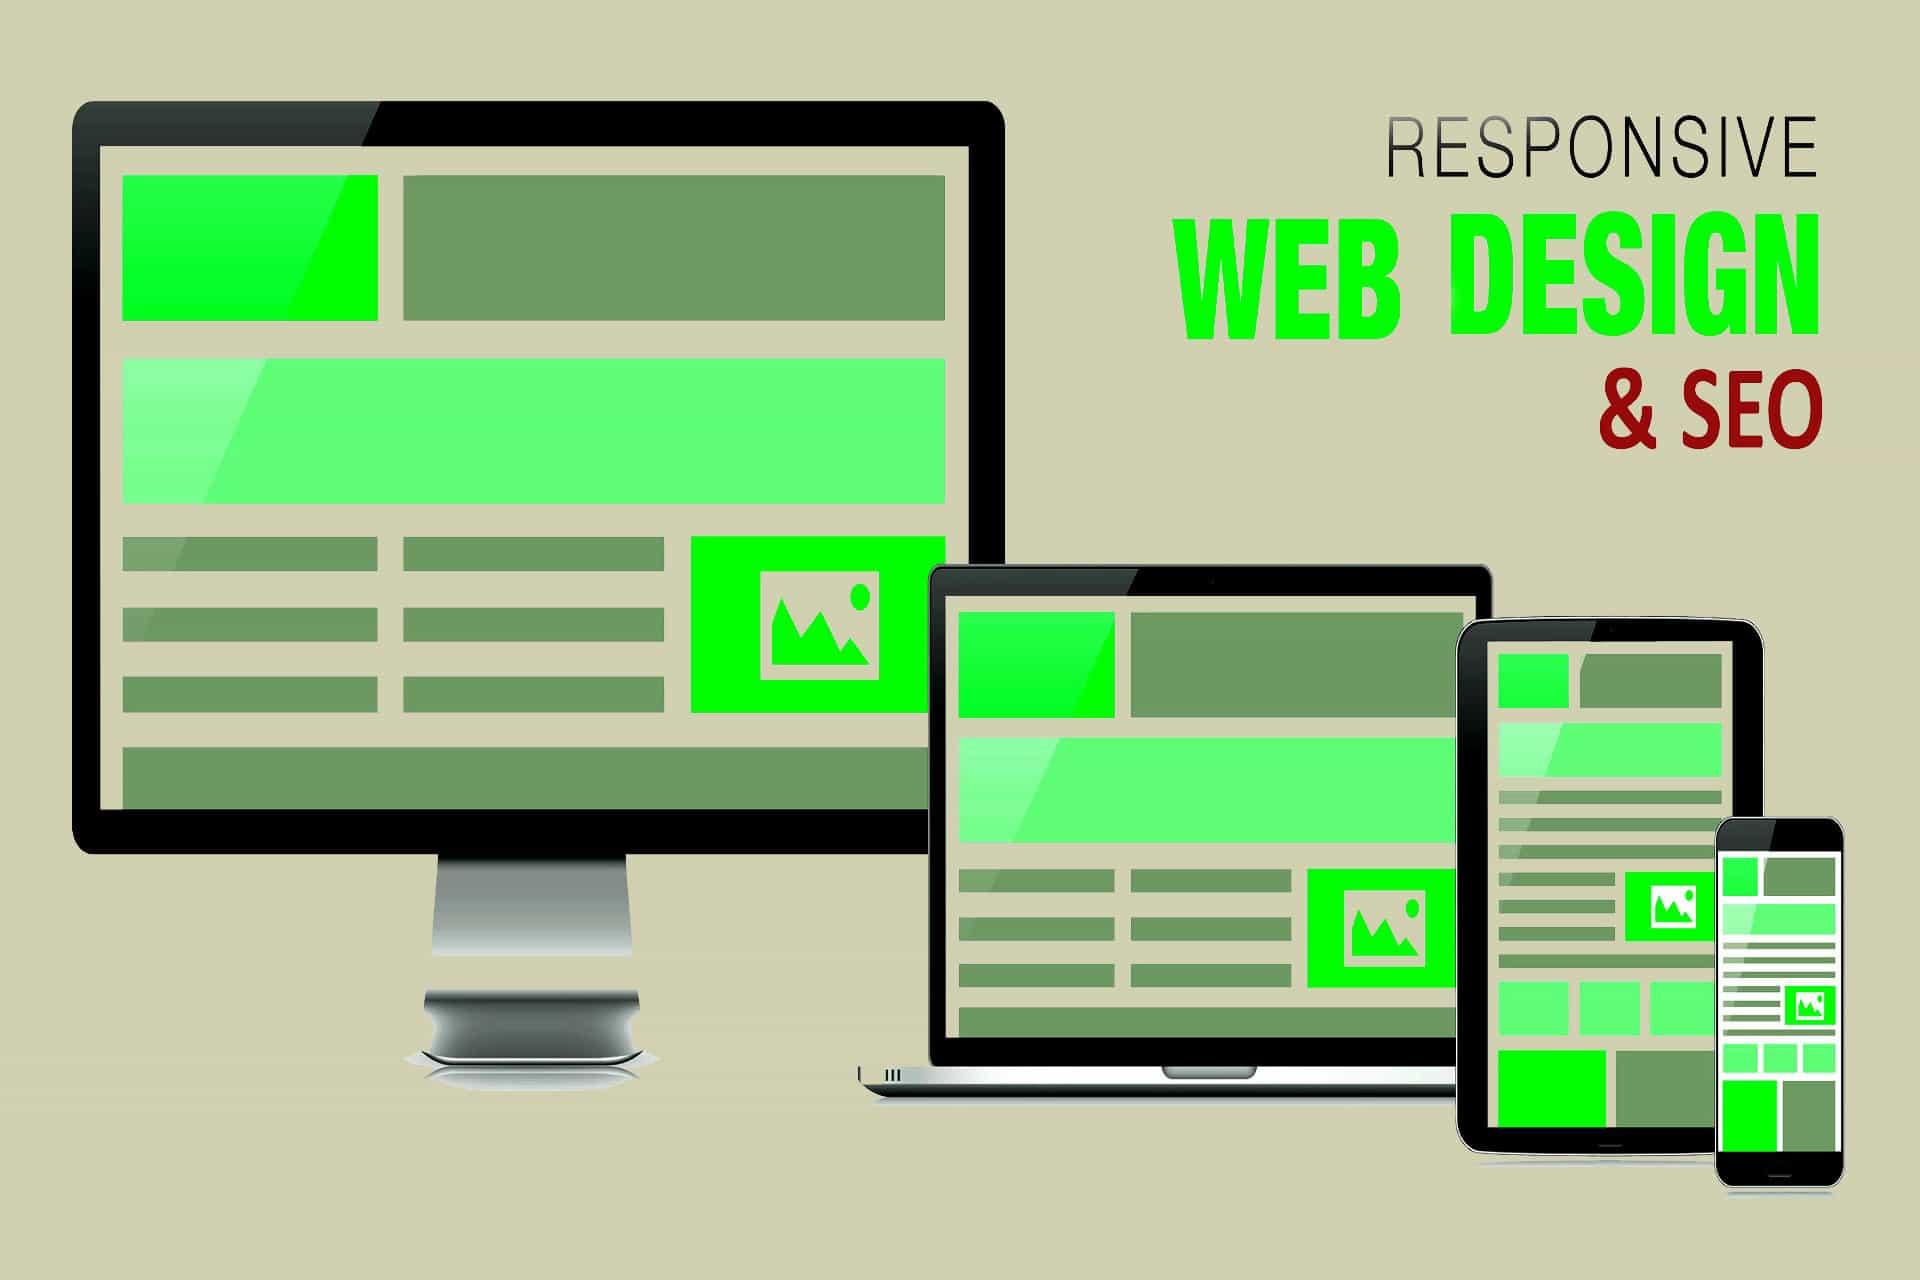 seo-benefits-of-responsive-web-designing